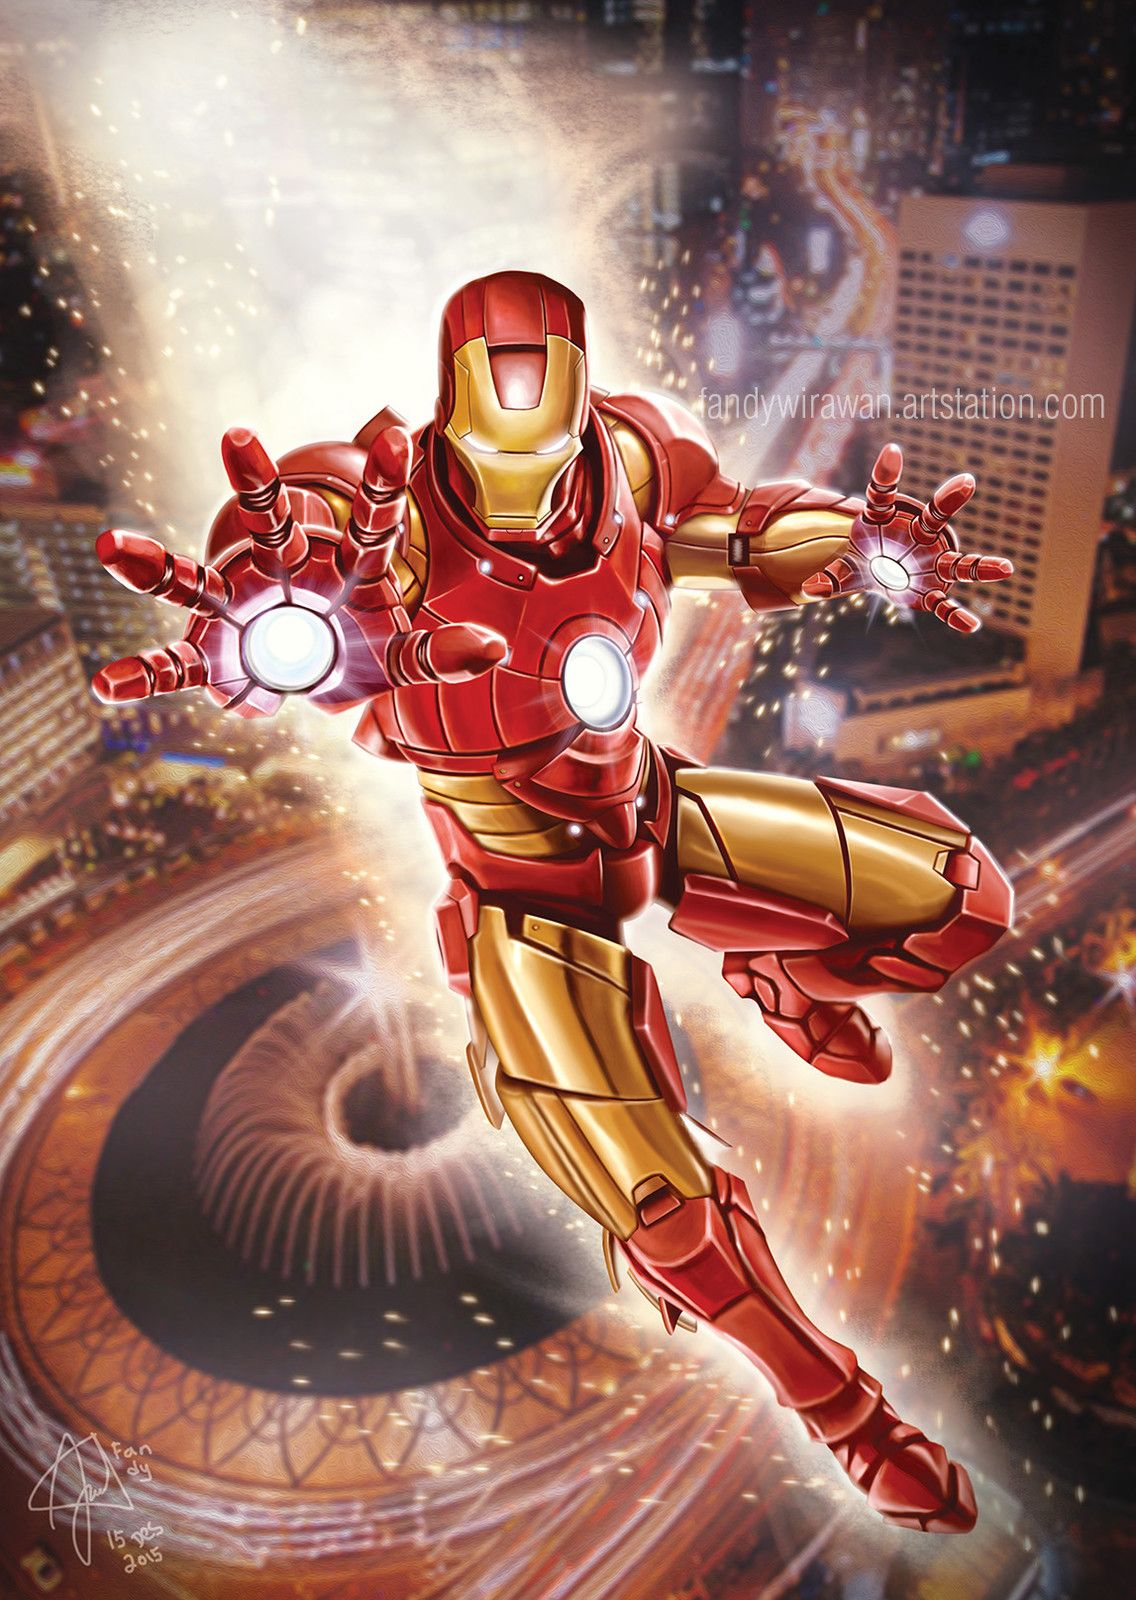 Iron #Man #Fan #Art  (Iron man) By: Fandy Wirawan  (THE * 5